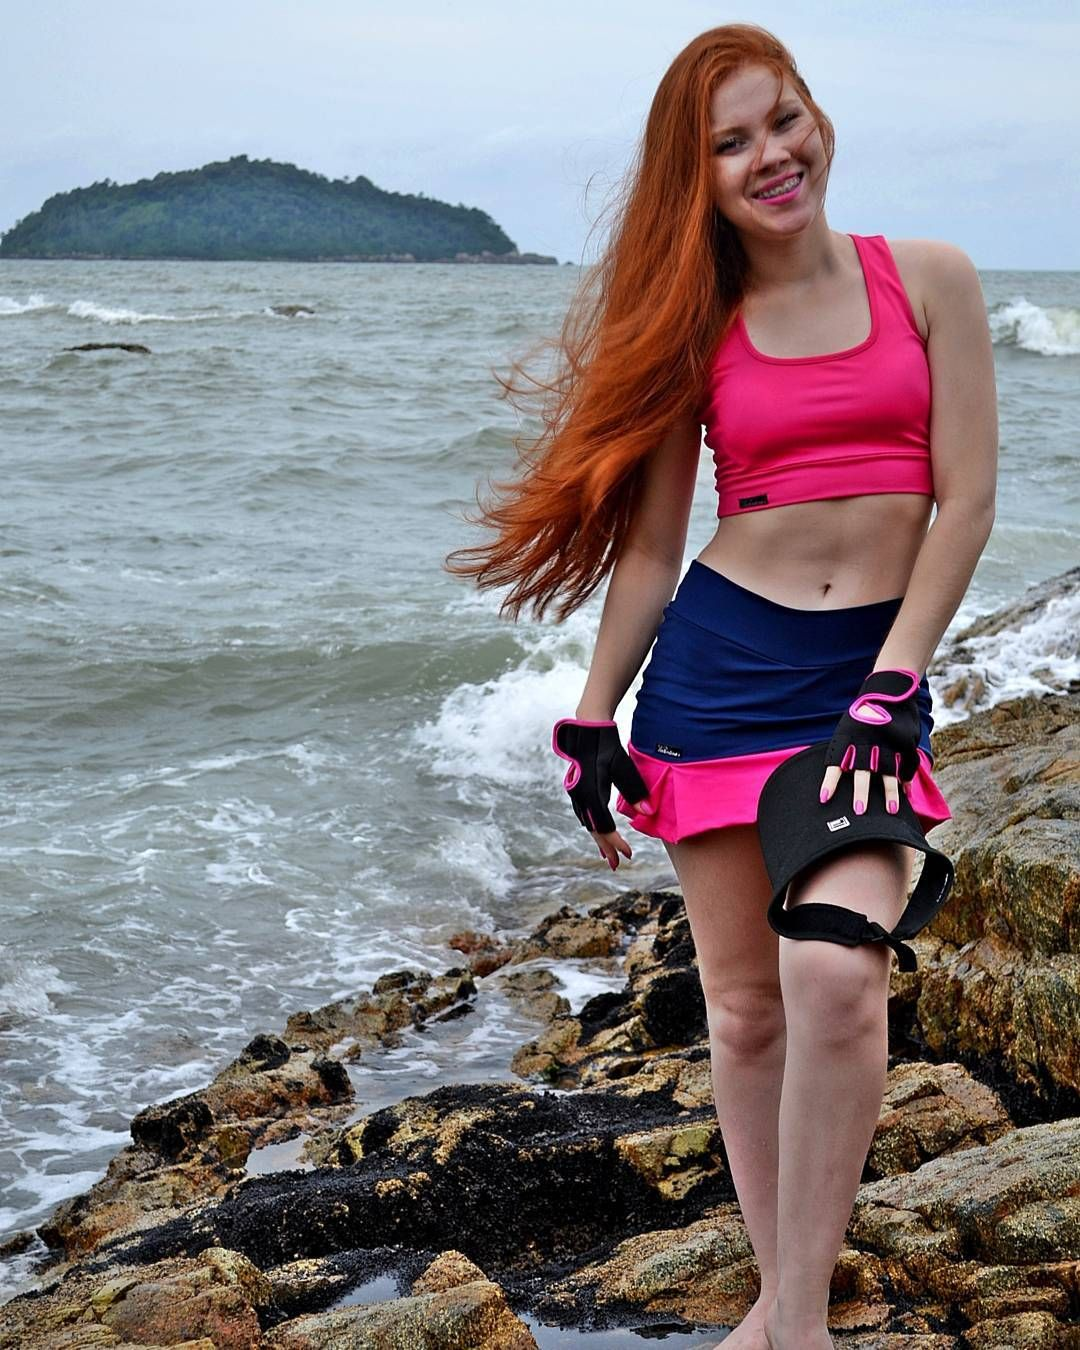 LINK DO SITE NA BIO!   Novidades no site!!!   http://ift.tt/23sFKHW Whatsapp: (47) 9600-6808  #academia #atleta #bodyfitness #estilodevida #boaforma #corrida #musculação #determinação #inspiration #progress #comic #gibi #hq #vacation #adidas #lifting #motivate #legday #instagood #life #insertpss #instafit #boxing #yoga #diet #gopro #olímpicos #training #workout #bailarina by valentinasfit